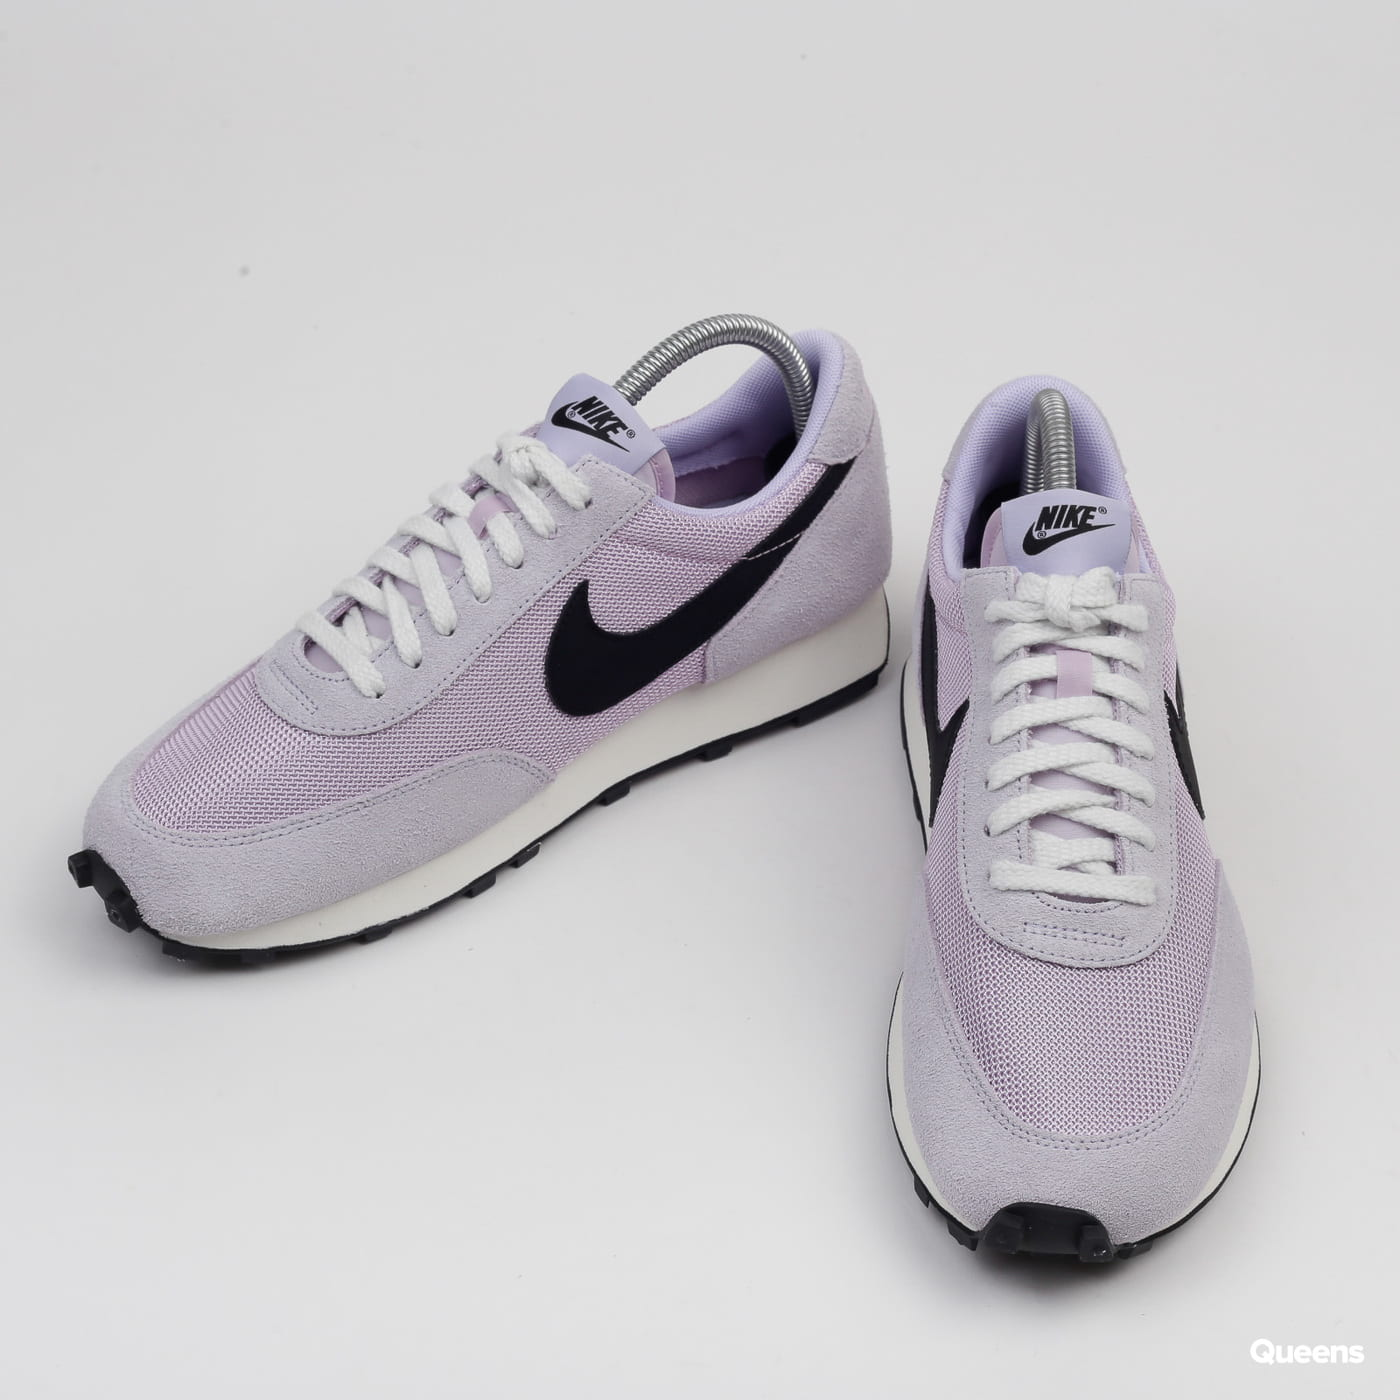 Nike Dbreak SP lavender mist / black - lilac mist